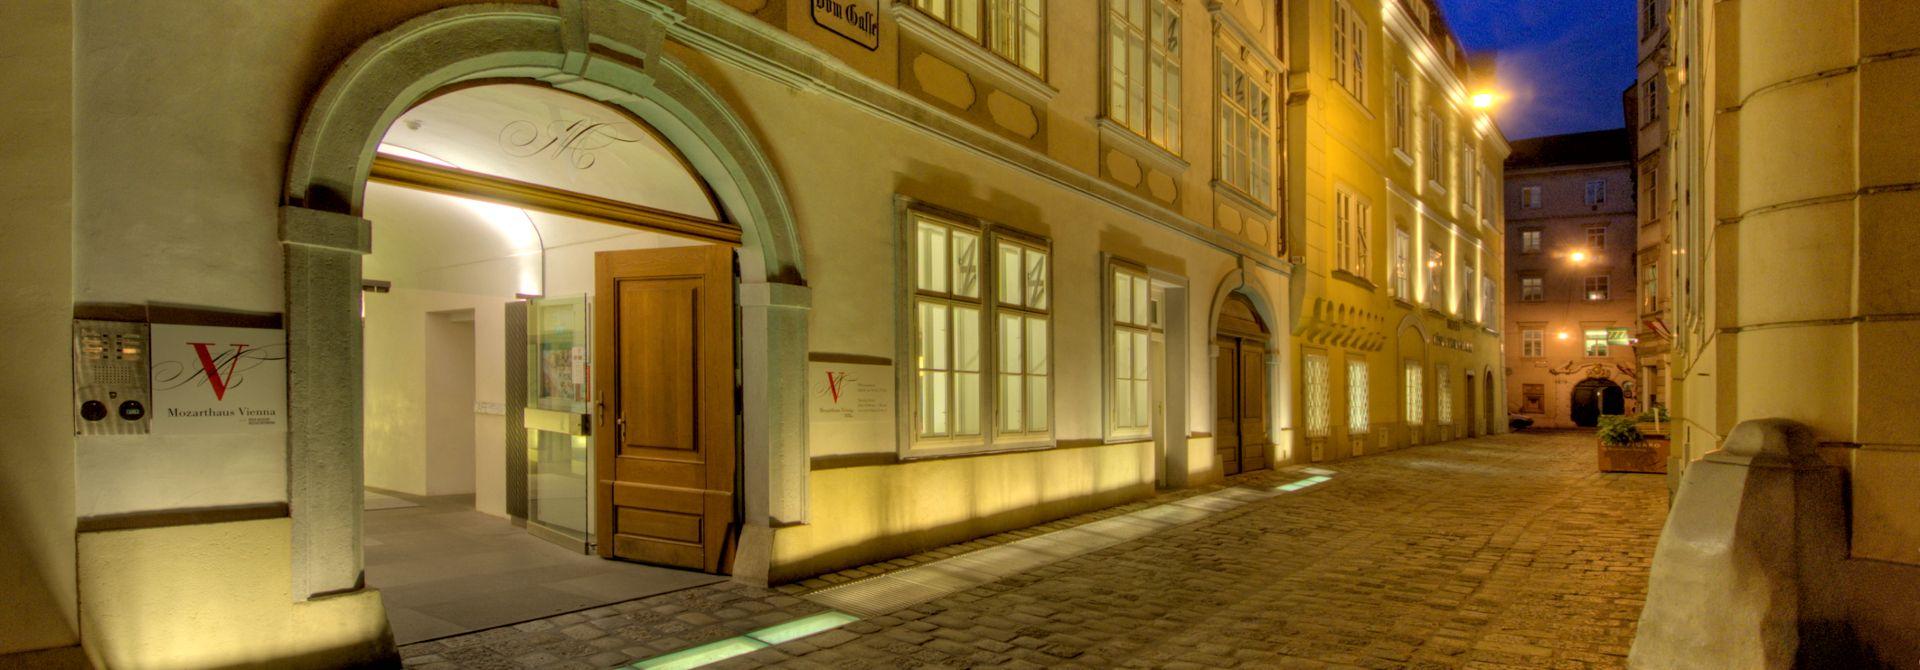 Vienna Mozarthaus Hero